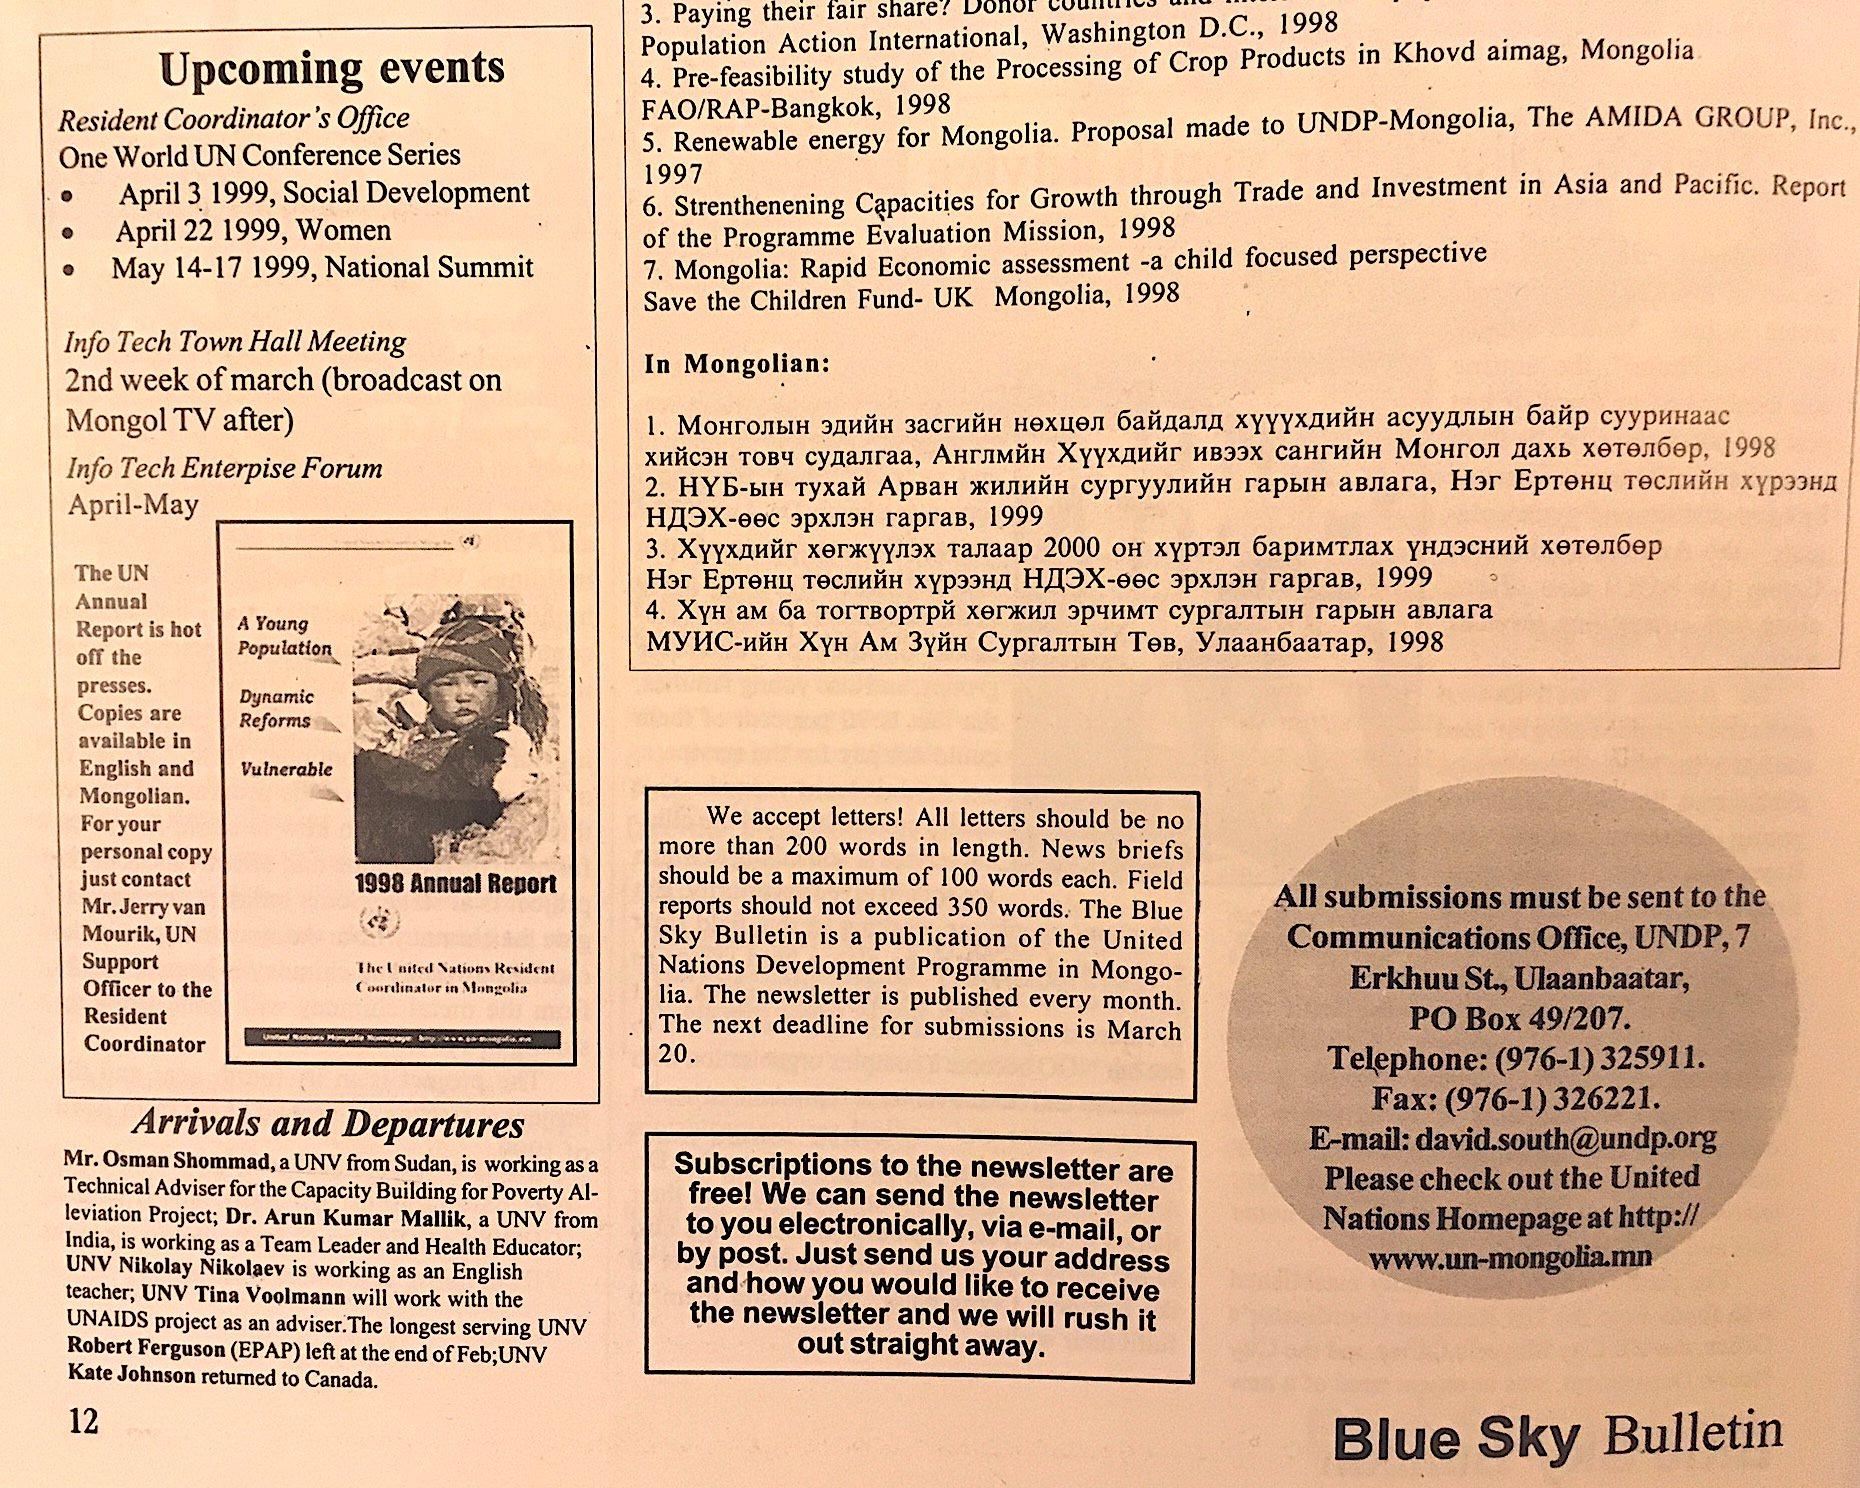 Blue Sky Bulletin